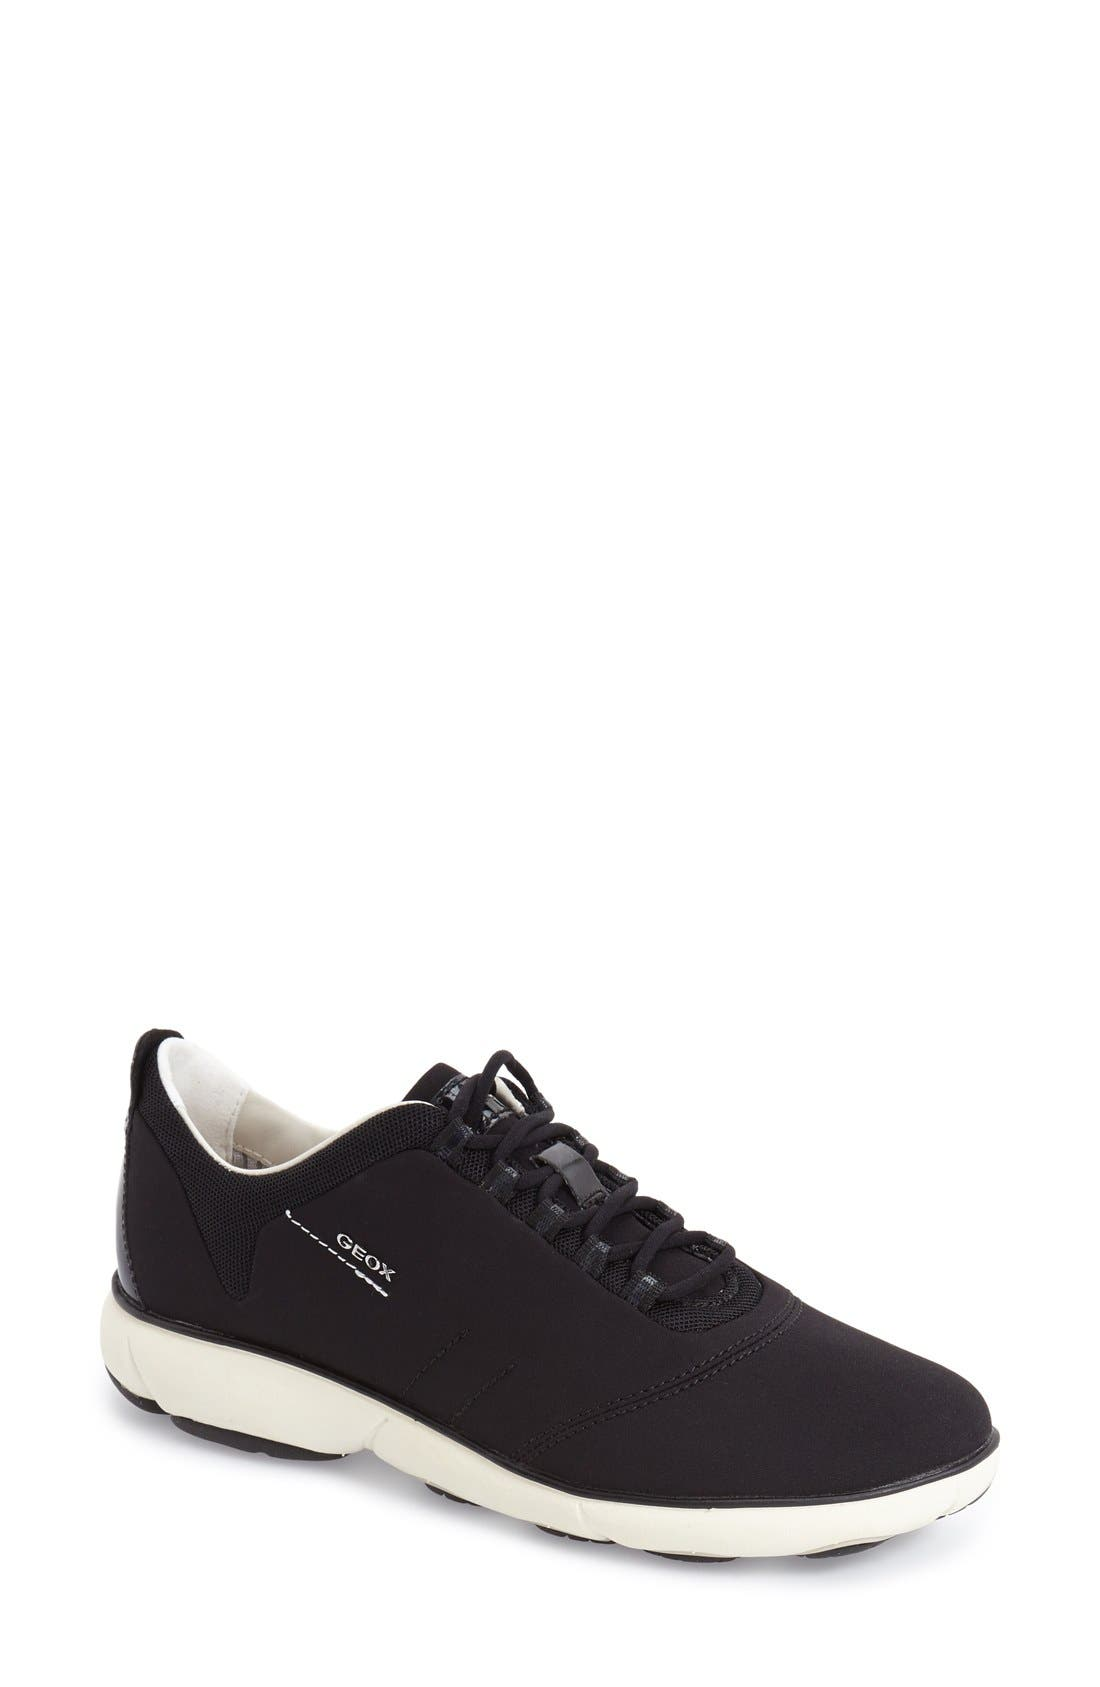 Nebula Slip-On Sneaker,                             Main thumbnail 1, color,                             001